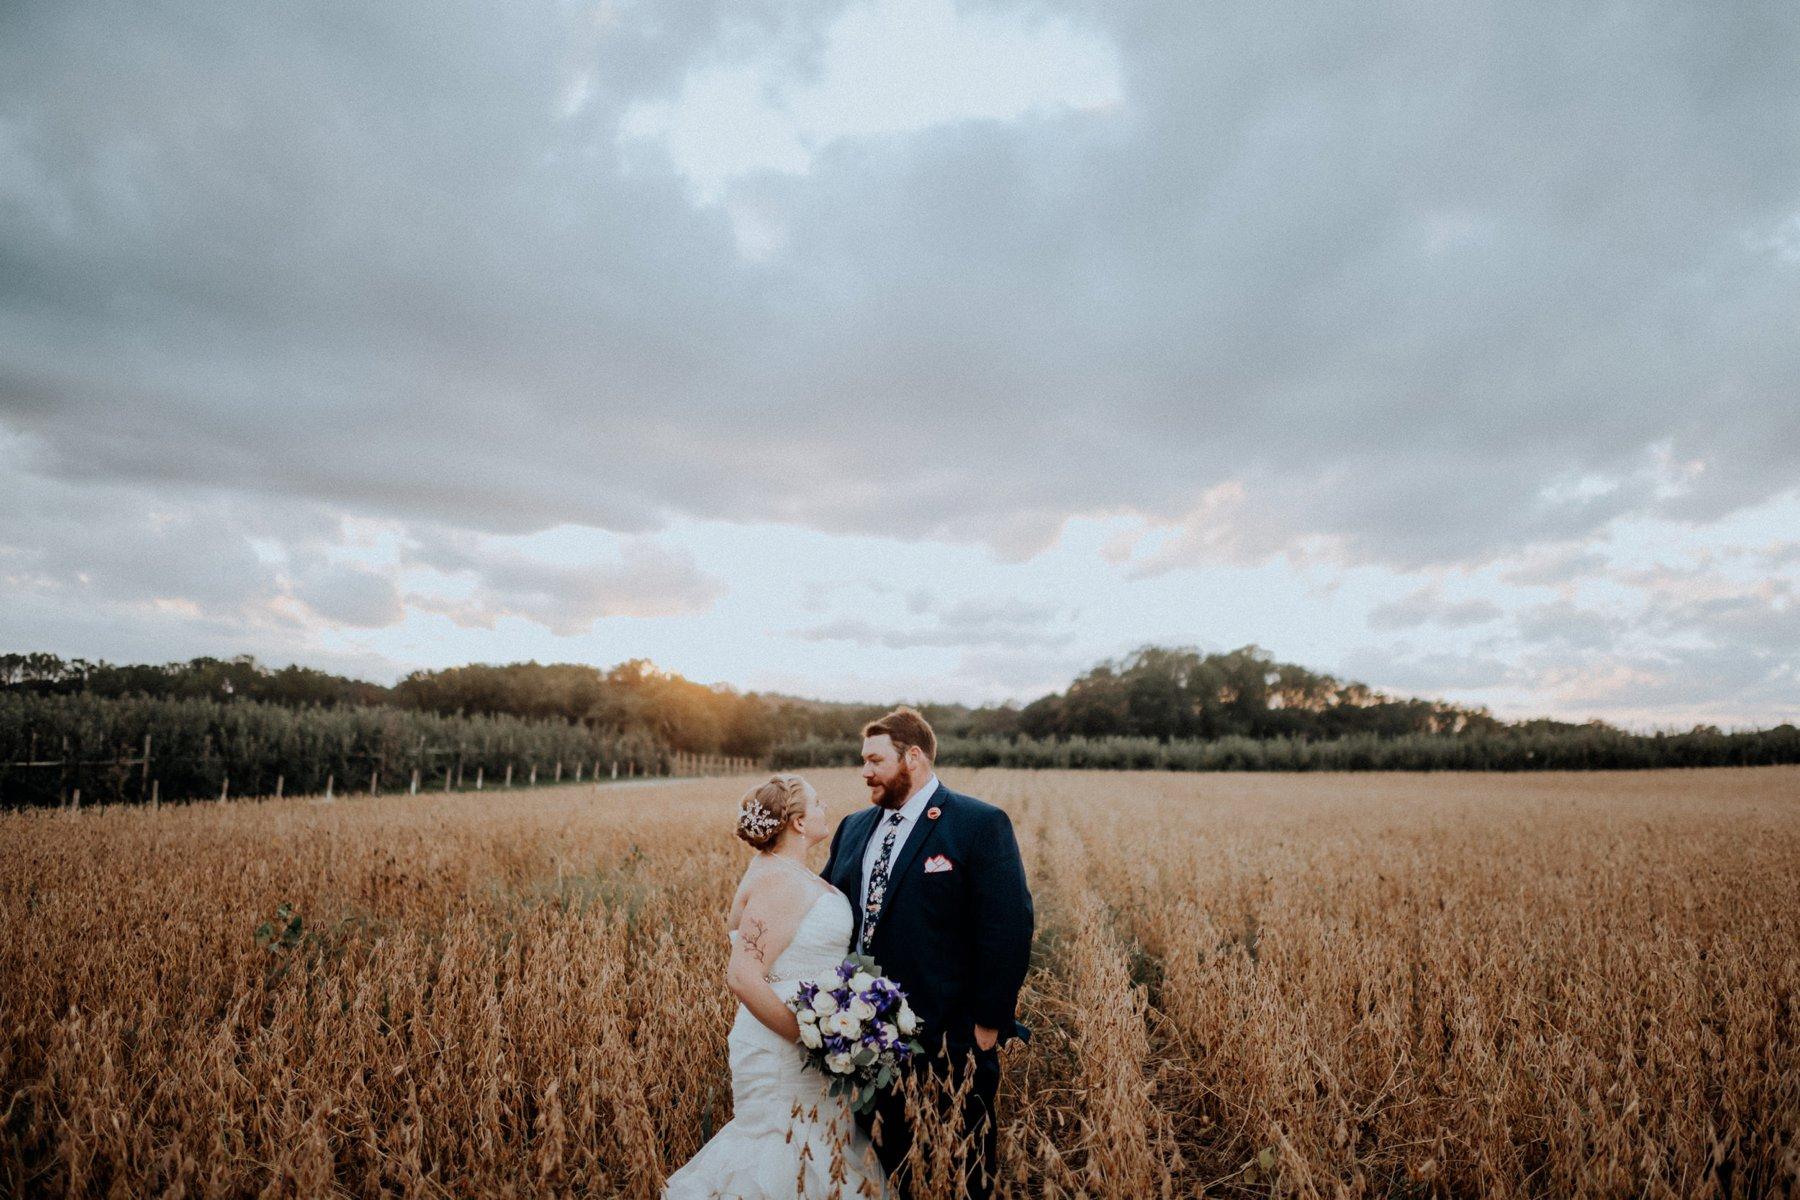 092-072-milburn-orchard-wedding-4.jpg